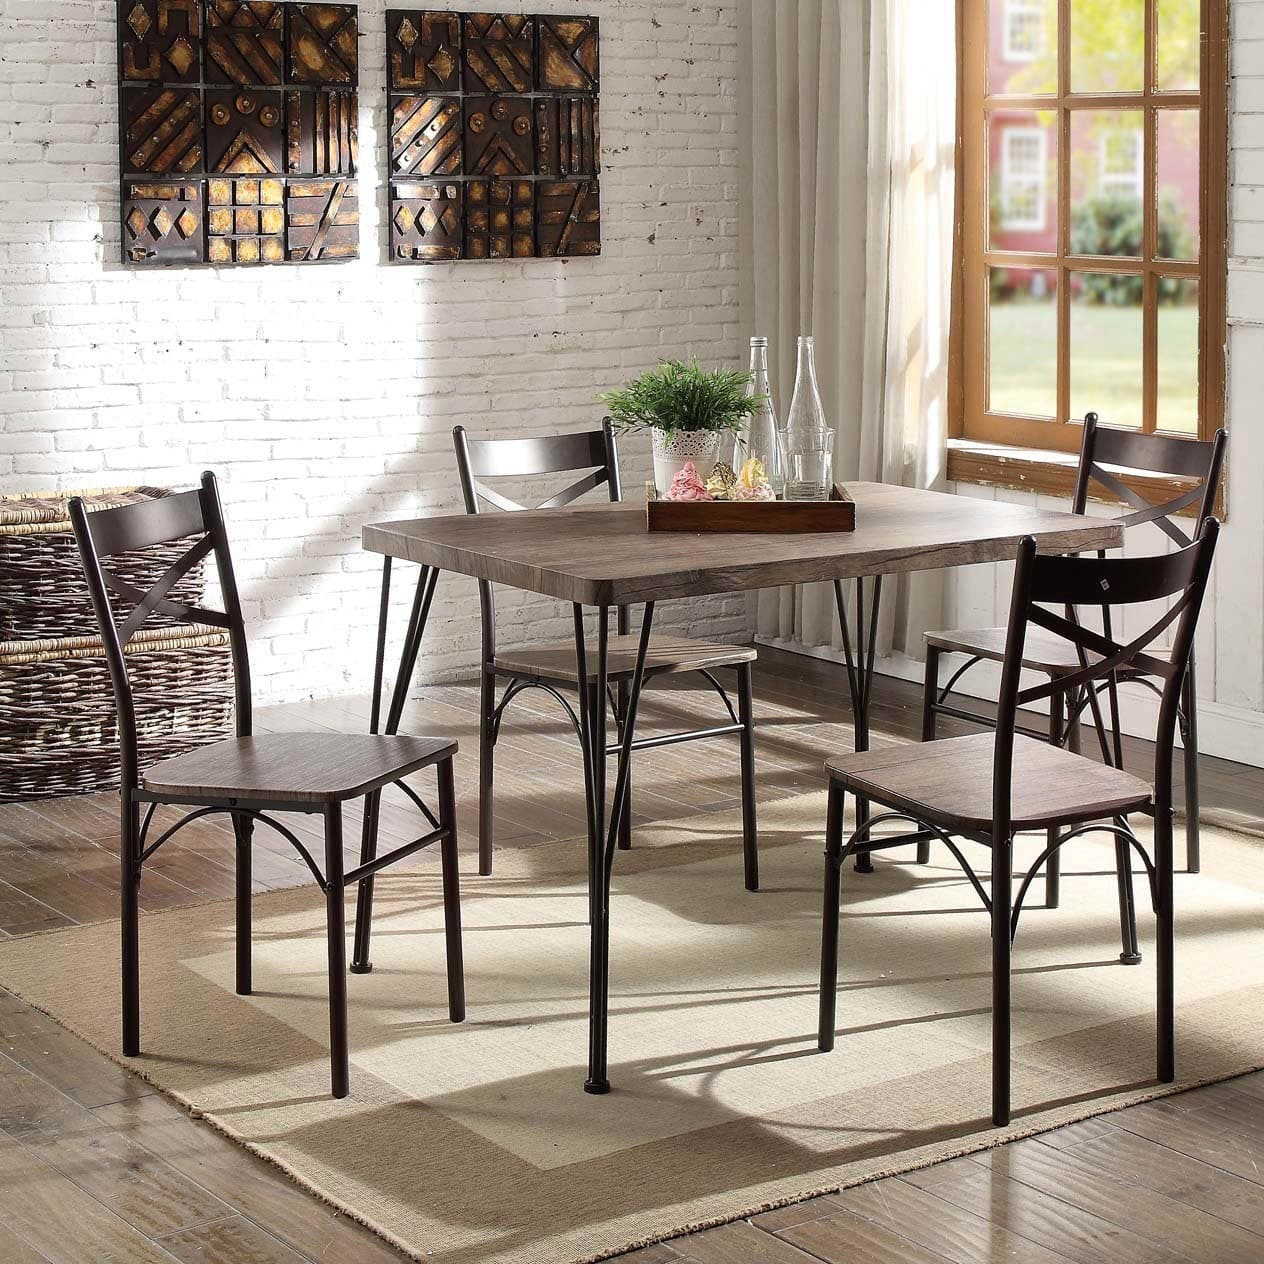 Furniture of America  Hathway Industrial 5-piece Dark Bronze Small Dining Set